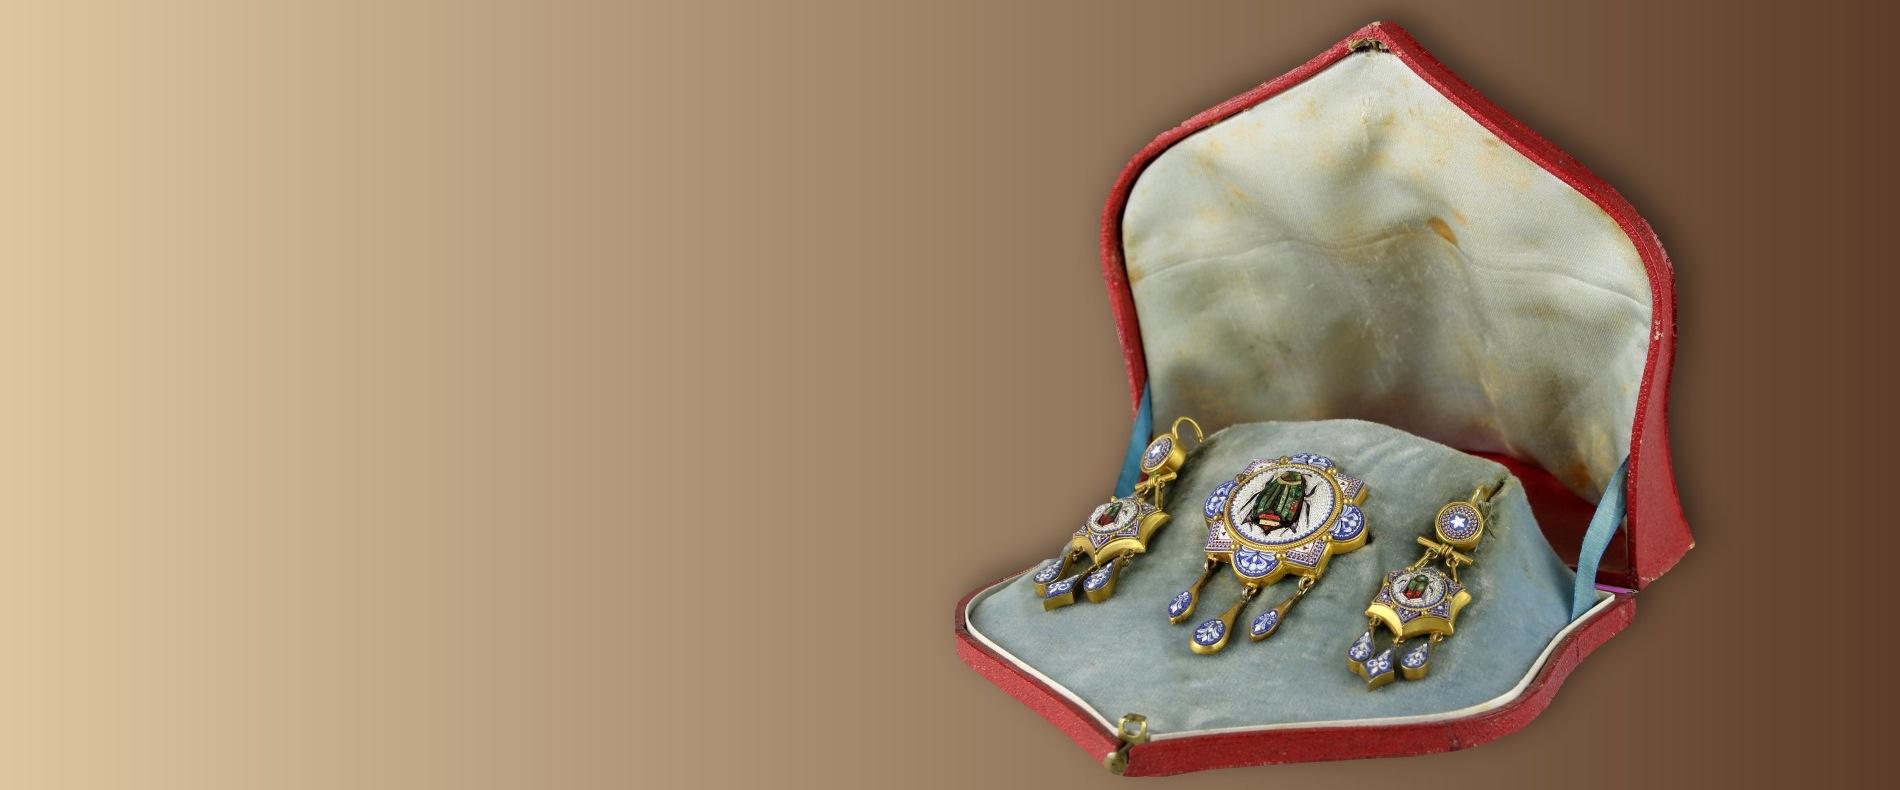 Mikromosaik Schmuckset<br />Rom um 1800